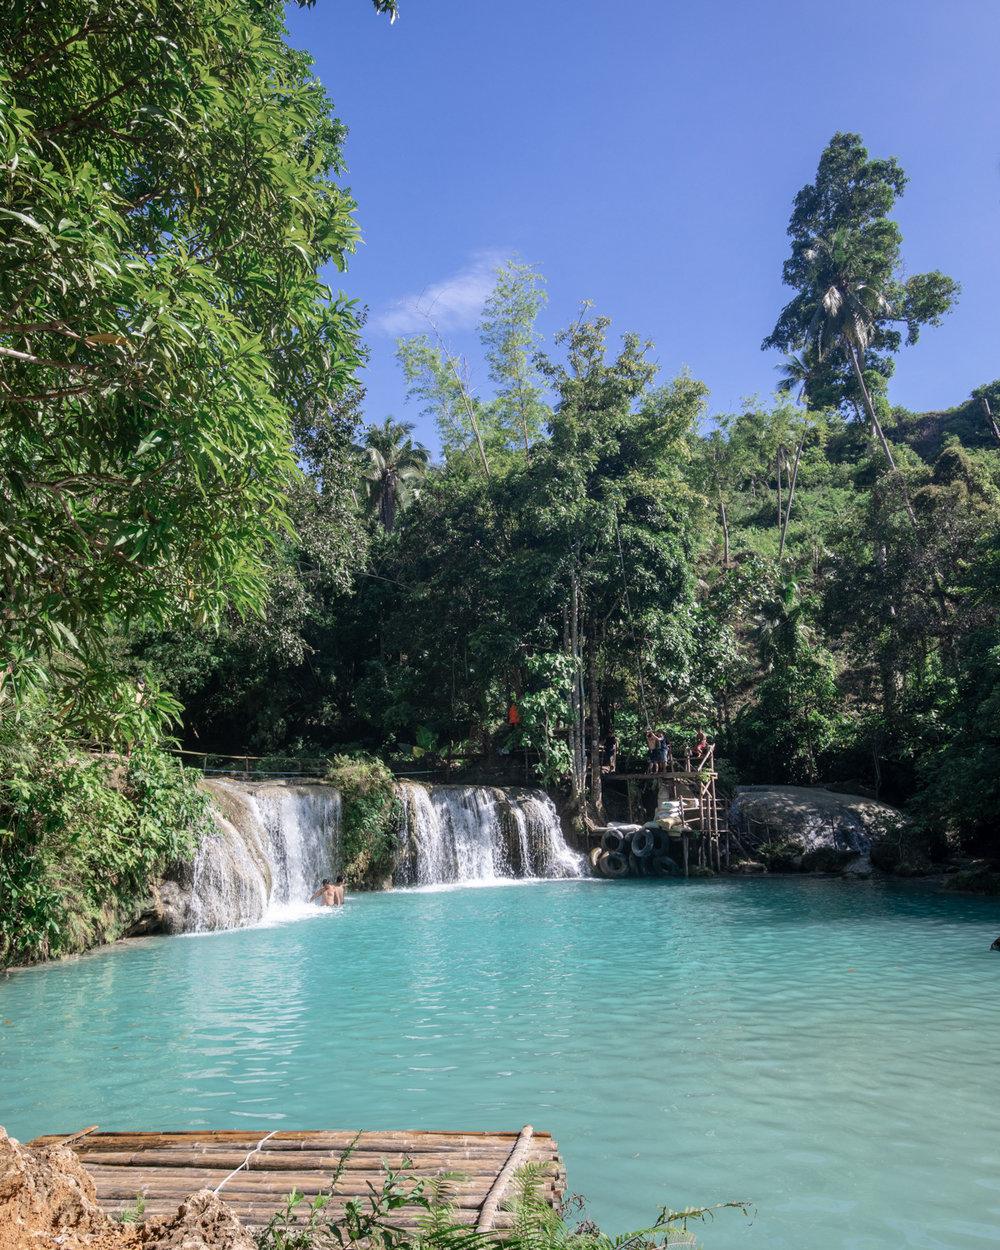 Cambugahay Waterfall in Siquijor Island